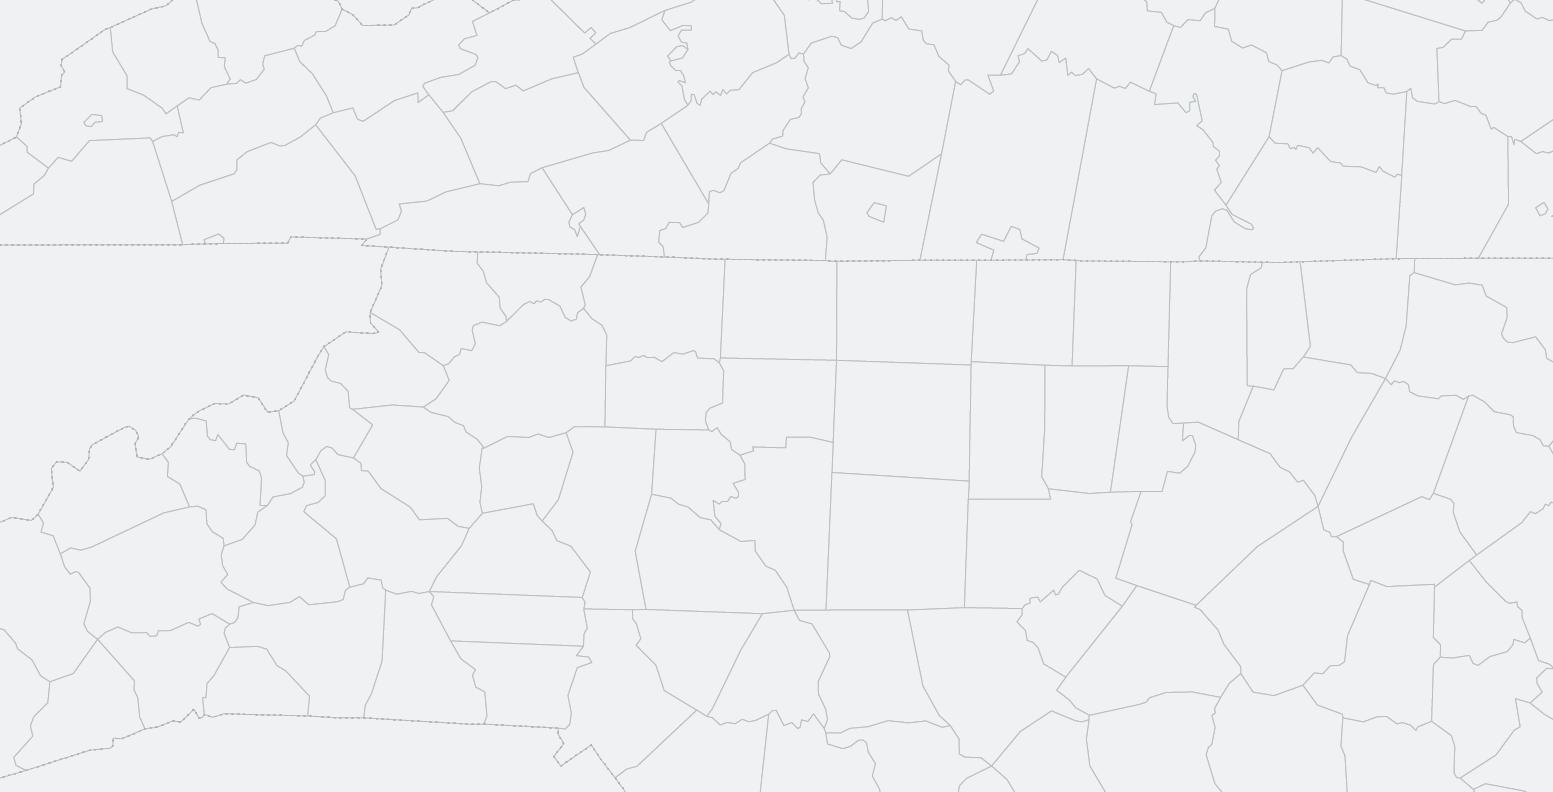 walnut cove hall propane location map